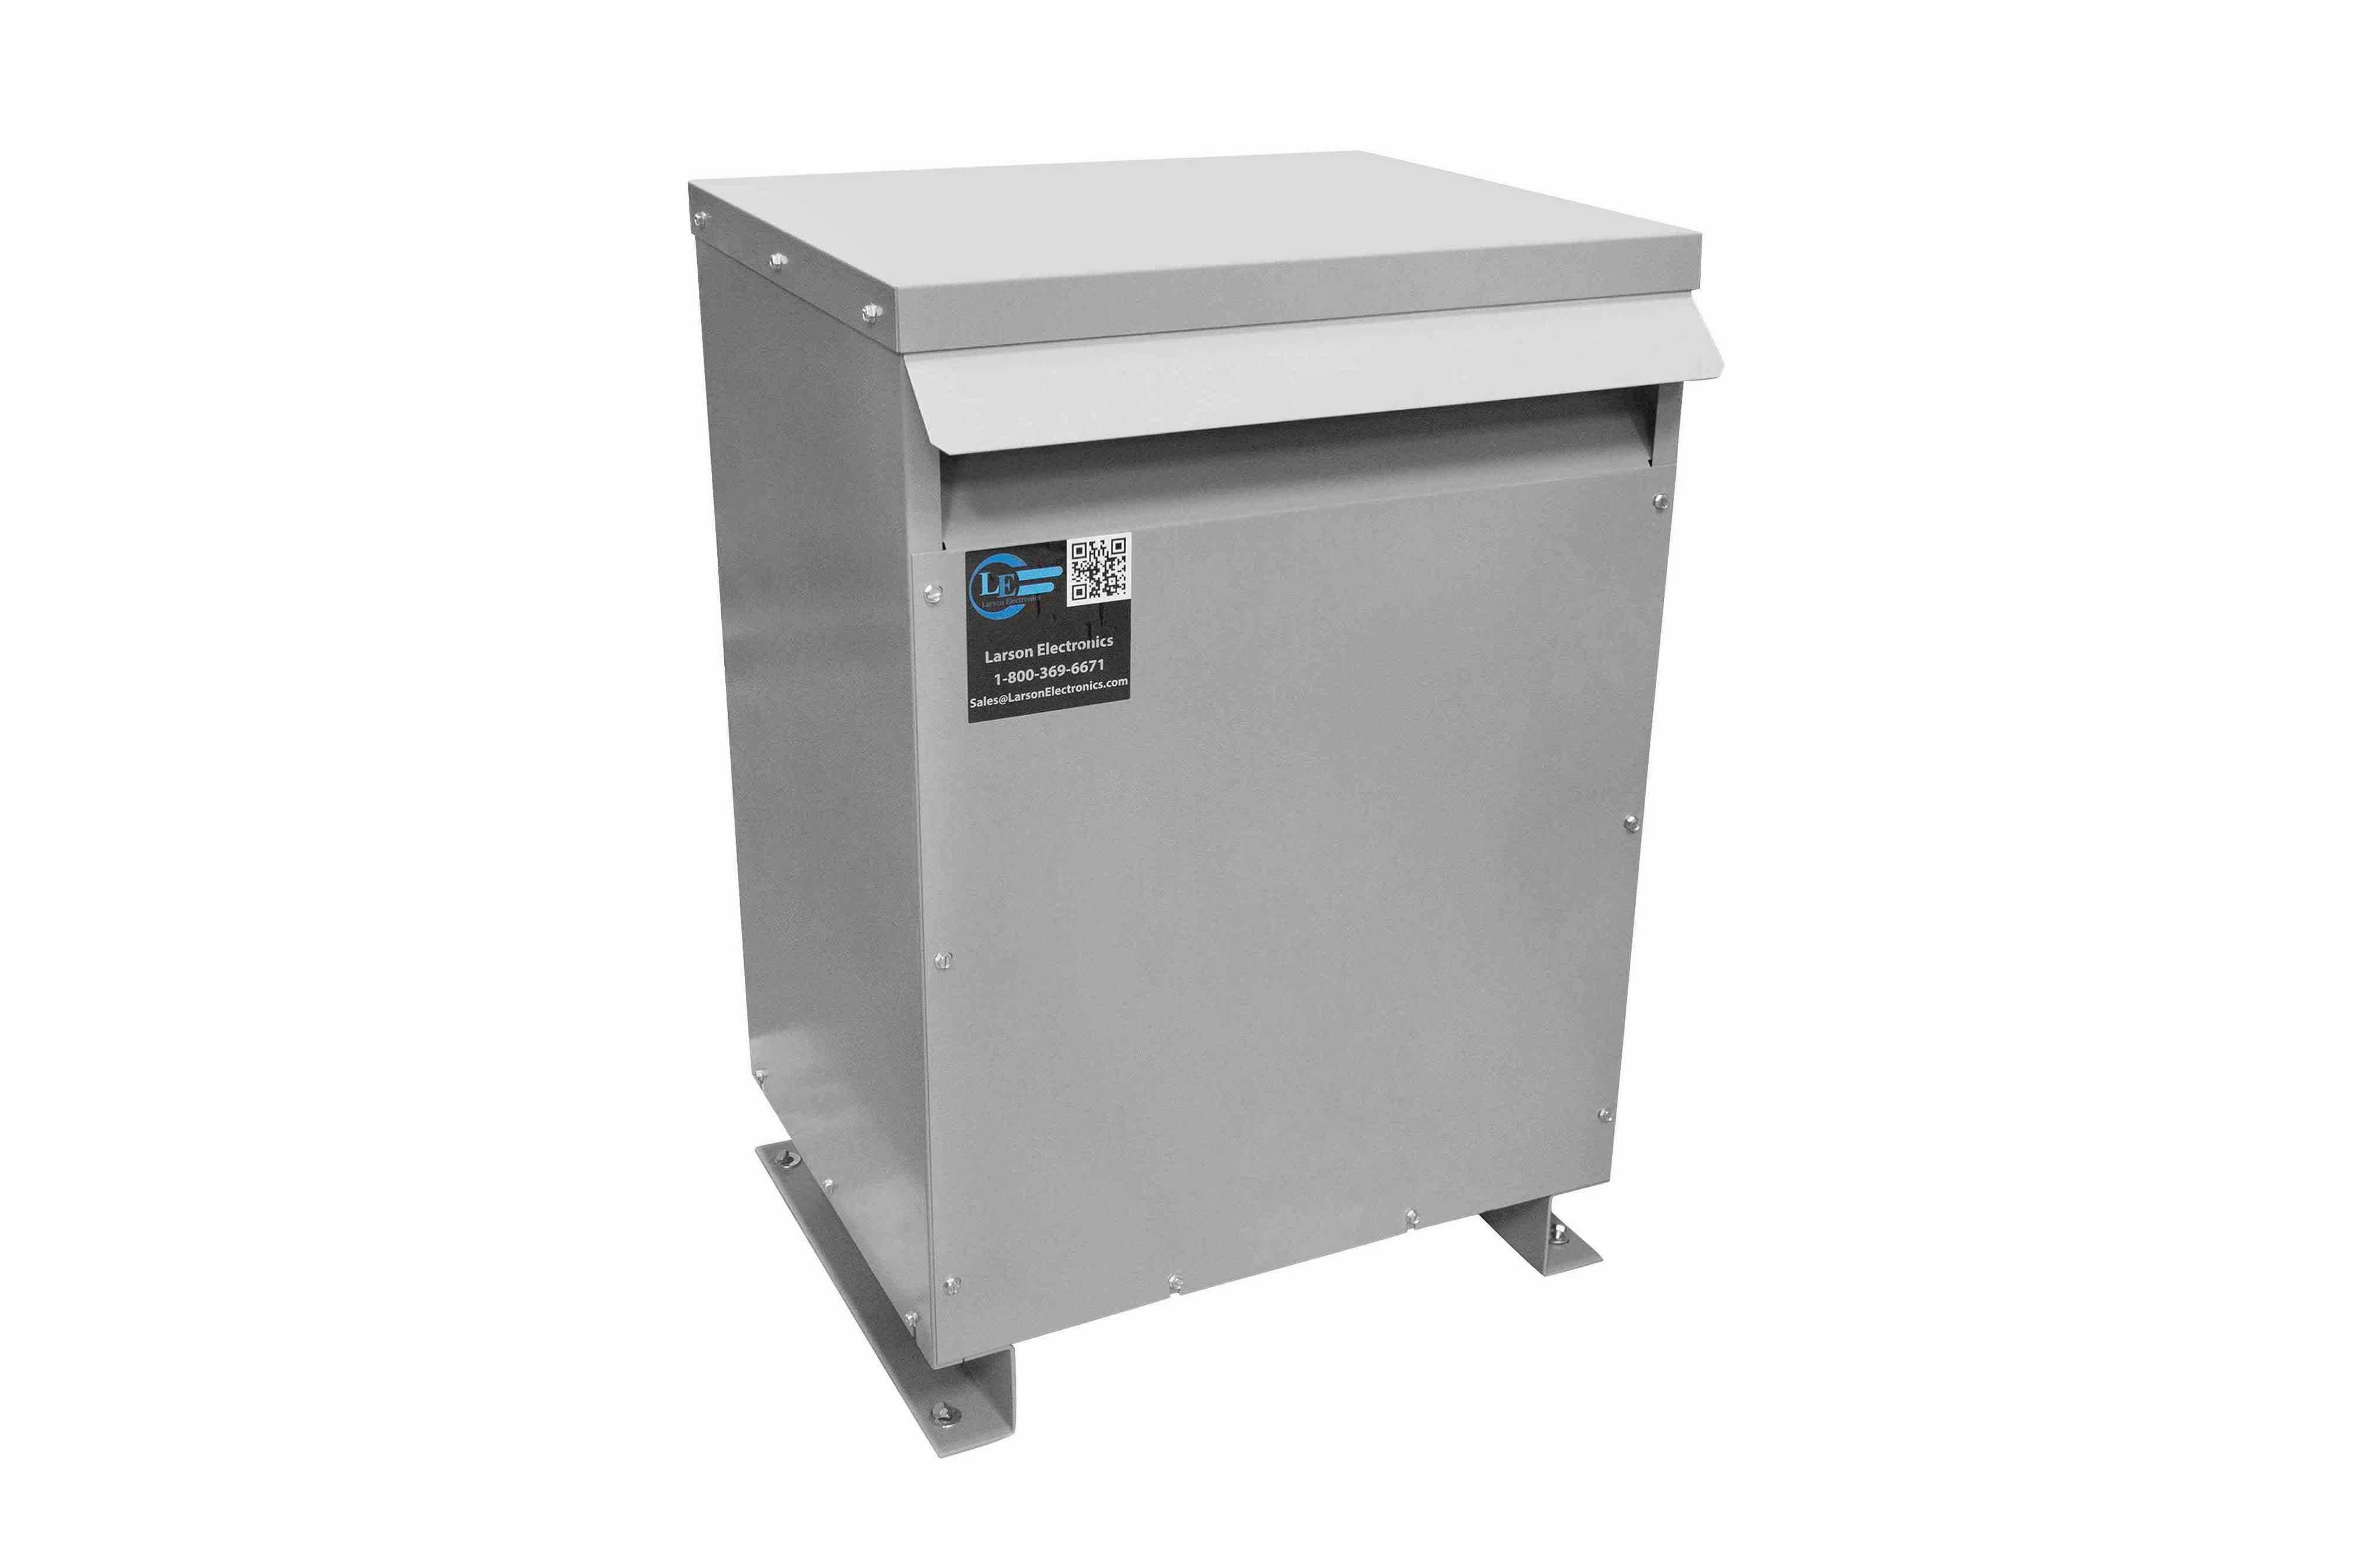 37.5 kVA 3PH Isolation Transformer, 240V Wye Primary, 208V Delta Secondary, N3R, Ventilated, 60 Hz